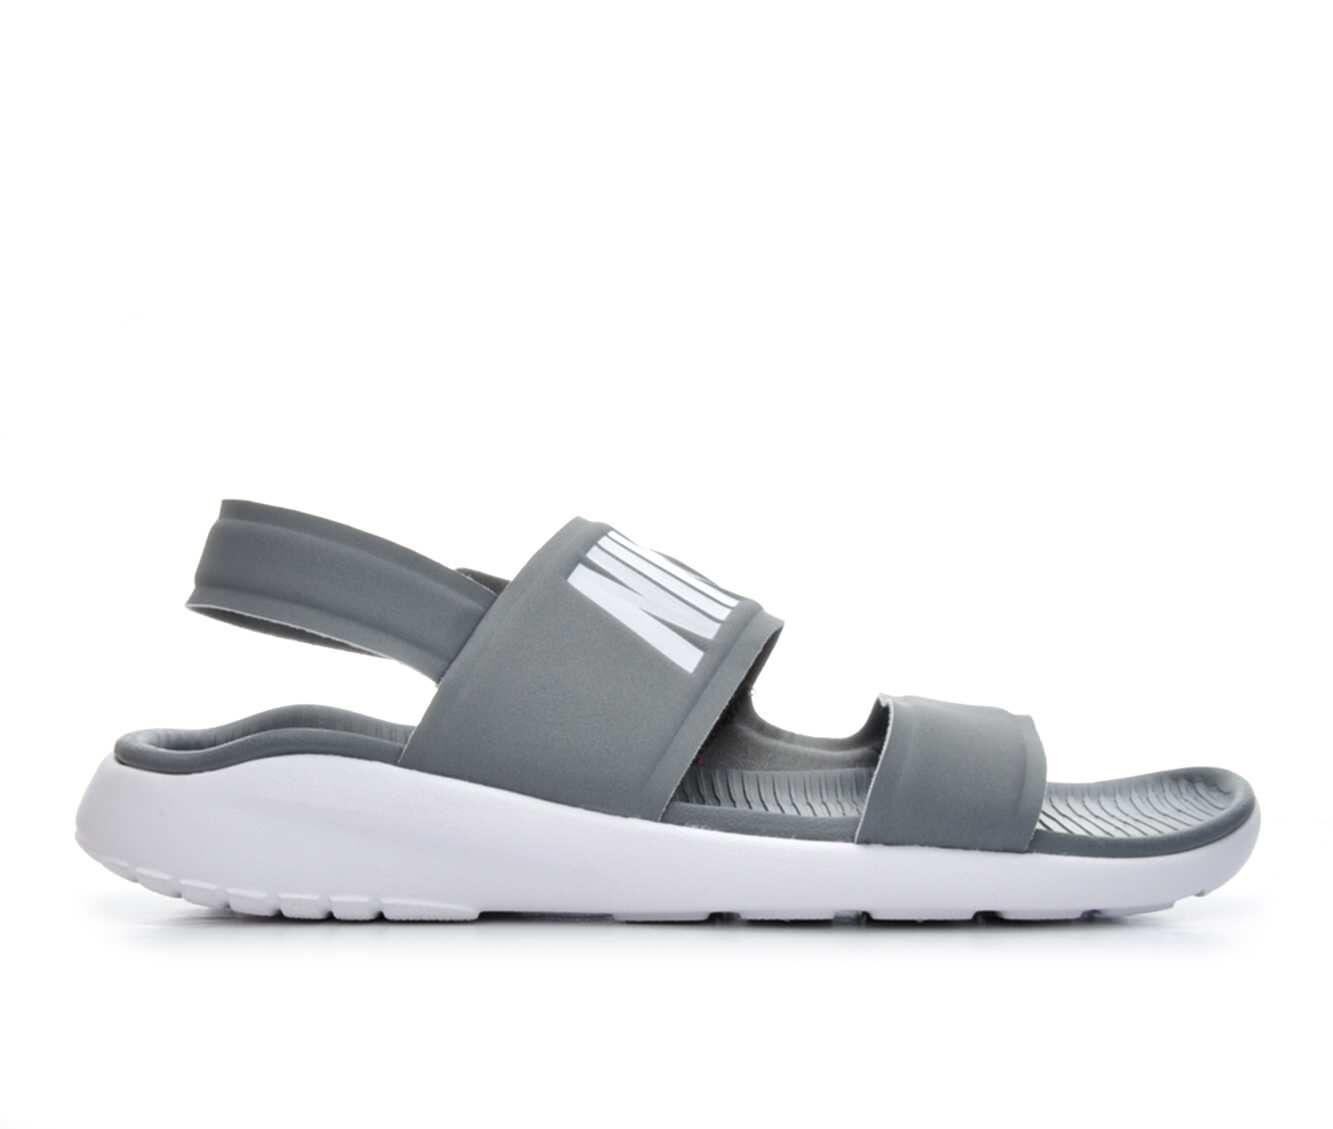 Nike Tanjun Sandal Sandals | Shoe Carnival